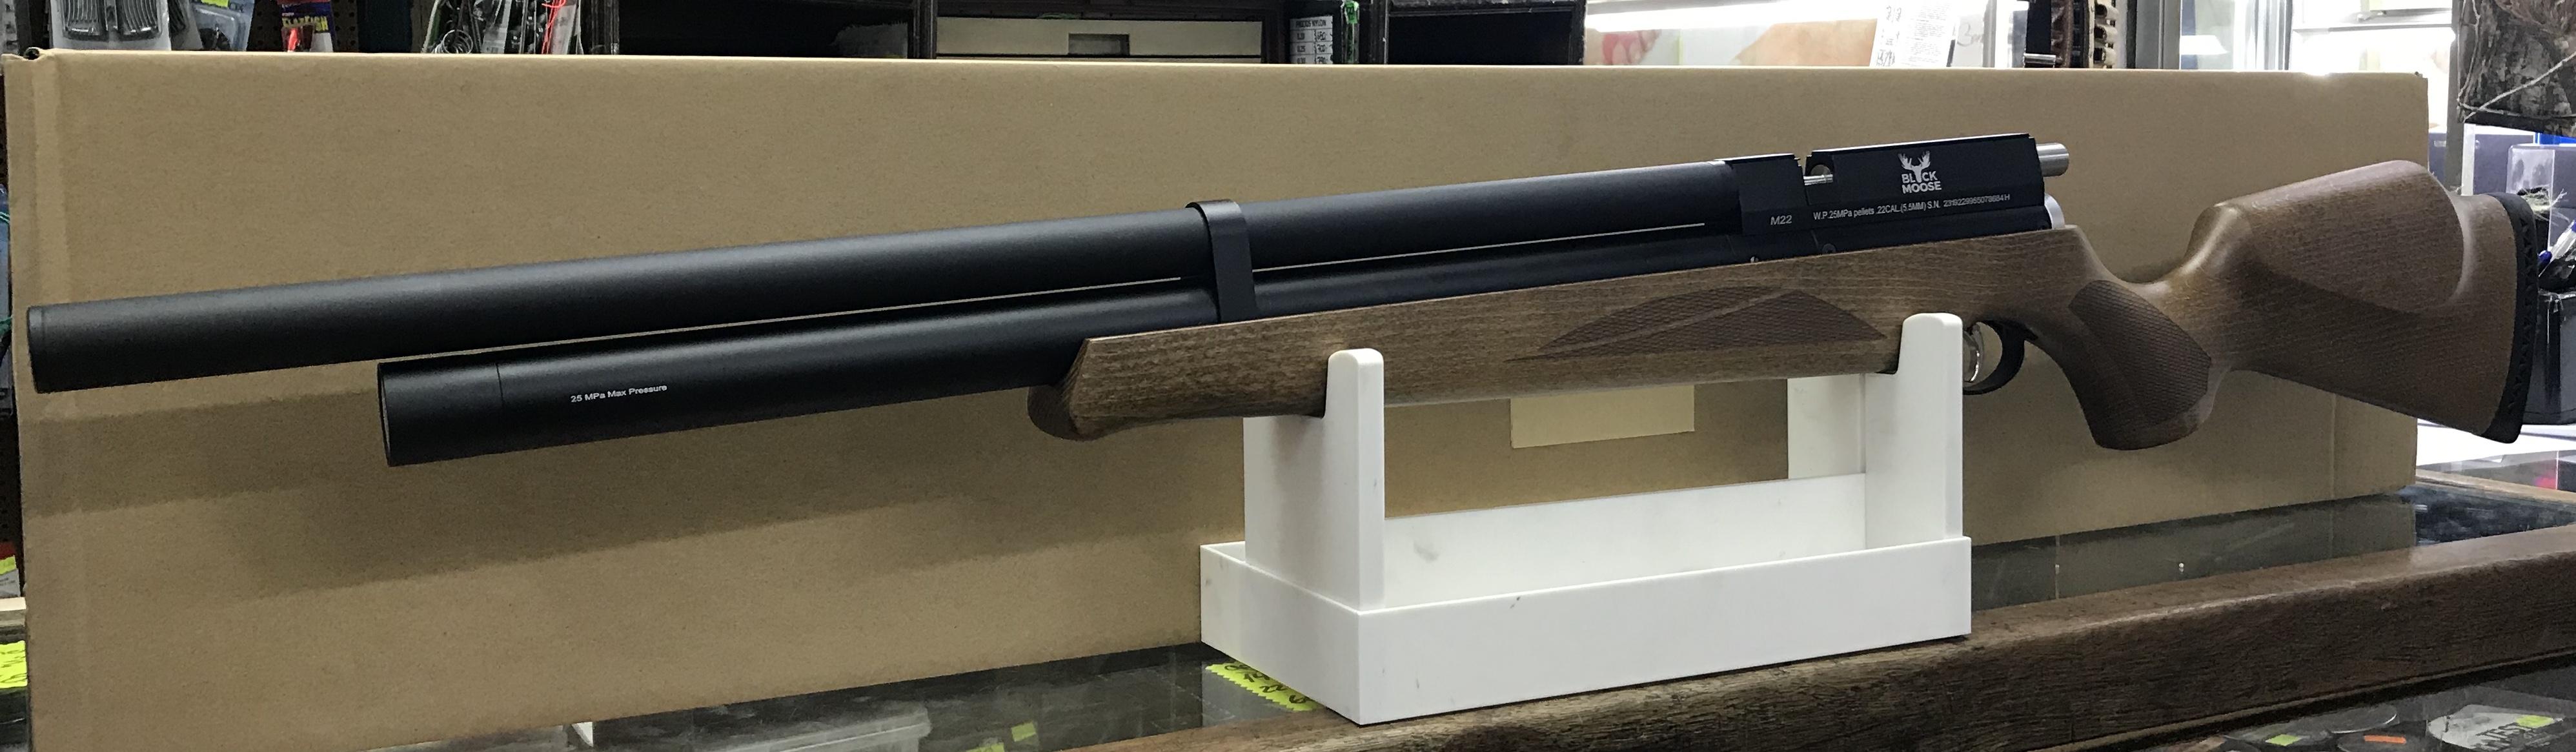 Rifle PCP M22 cal. 5,5+ bombin + mira3-9x40